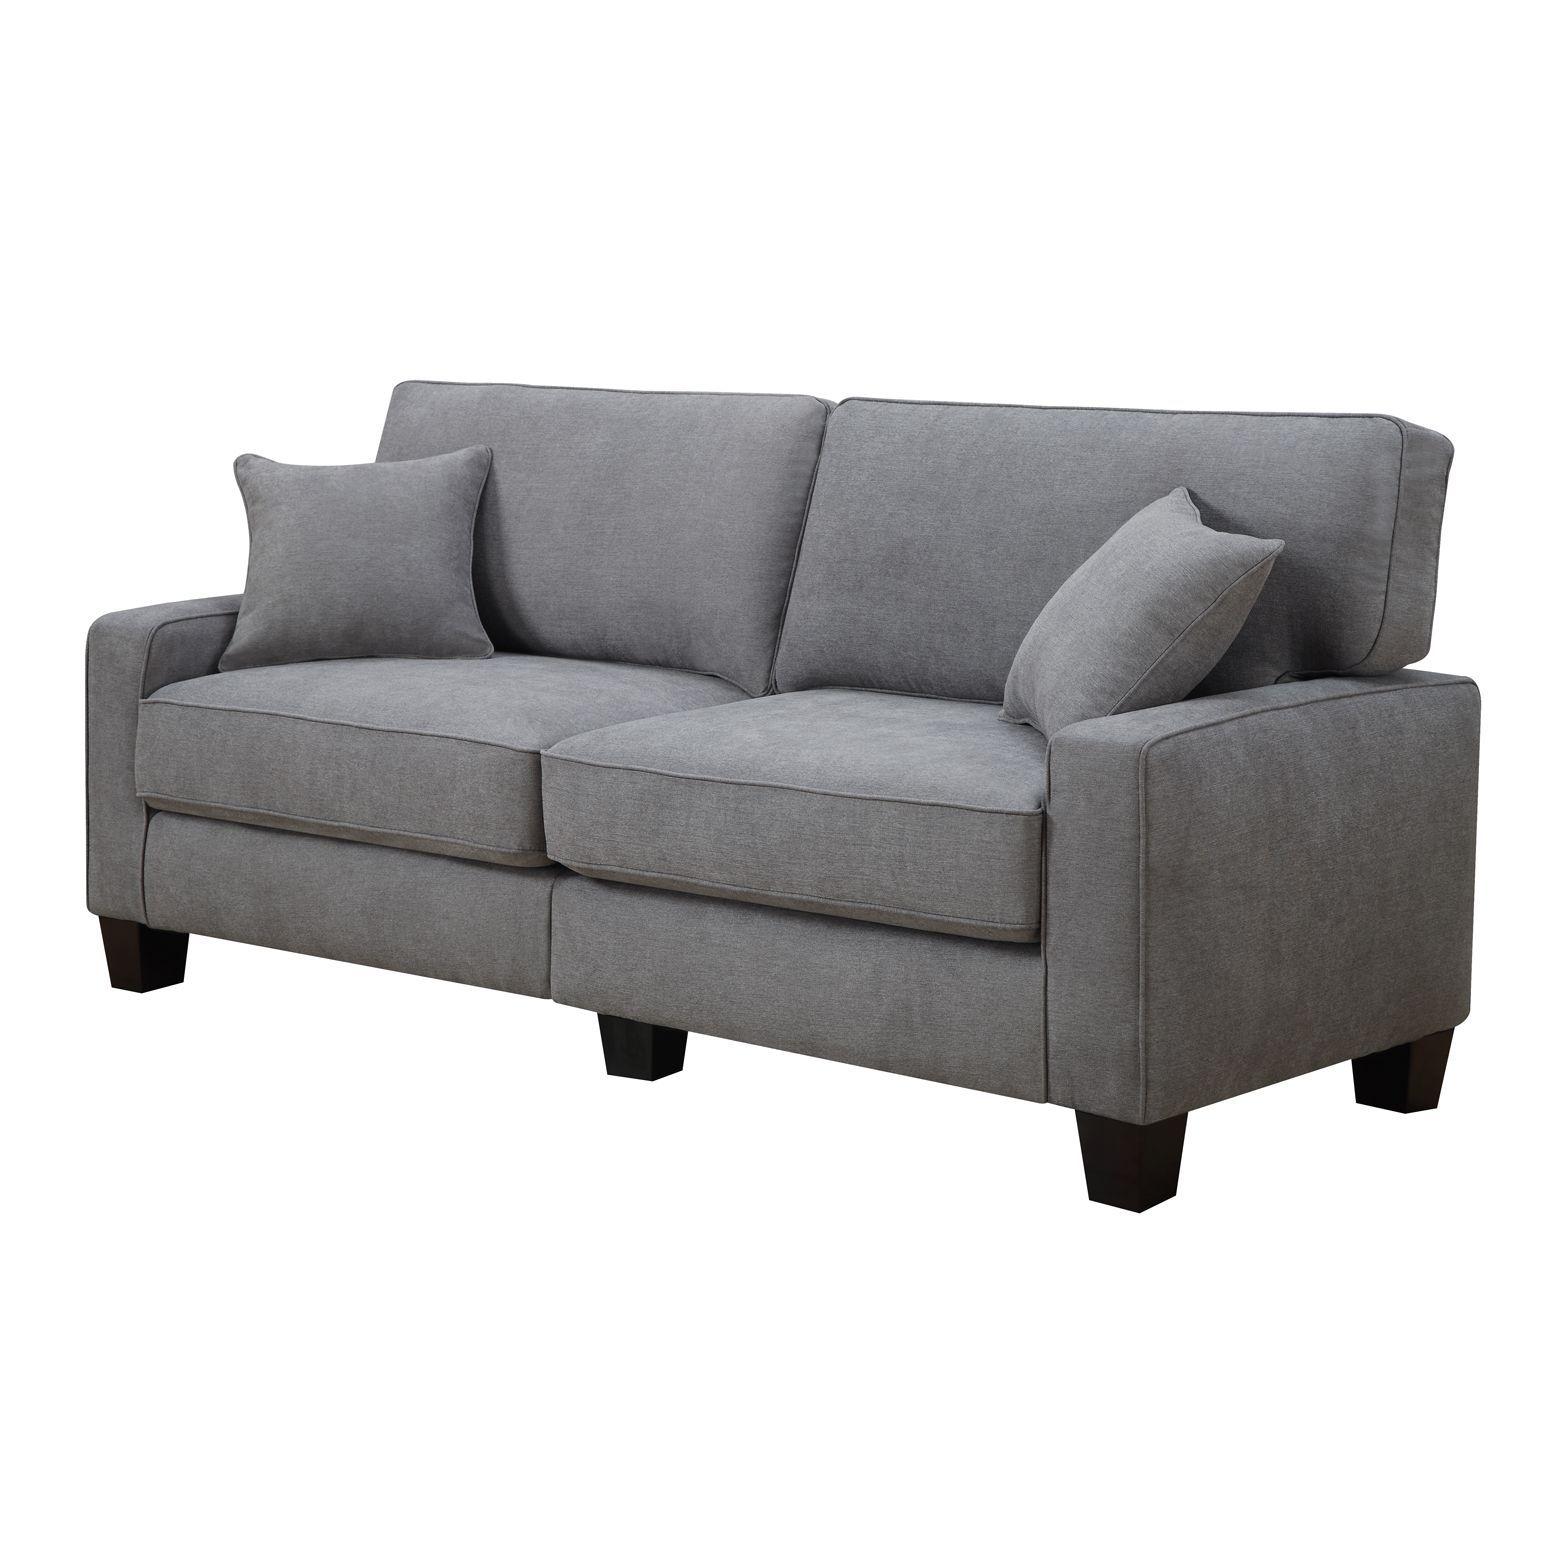 Overstock Com Online Shopping Bedding Furniture Electronics Jewelry Clothing More Grey Fabric Sofa Sofa Fabric Sofa